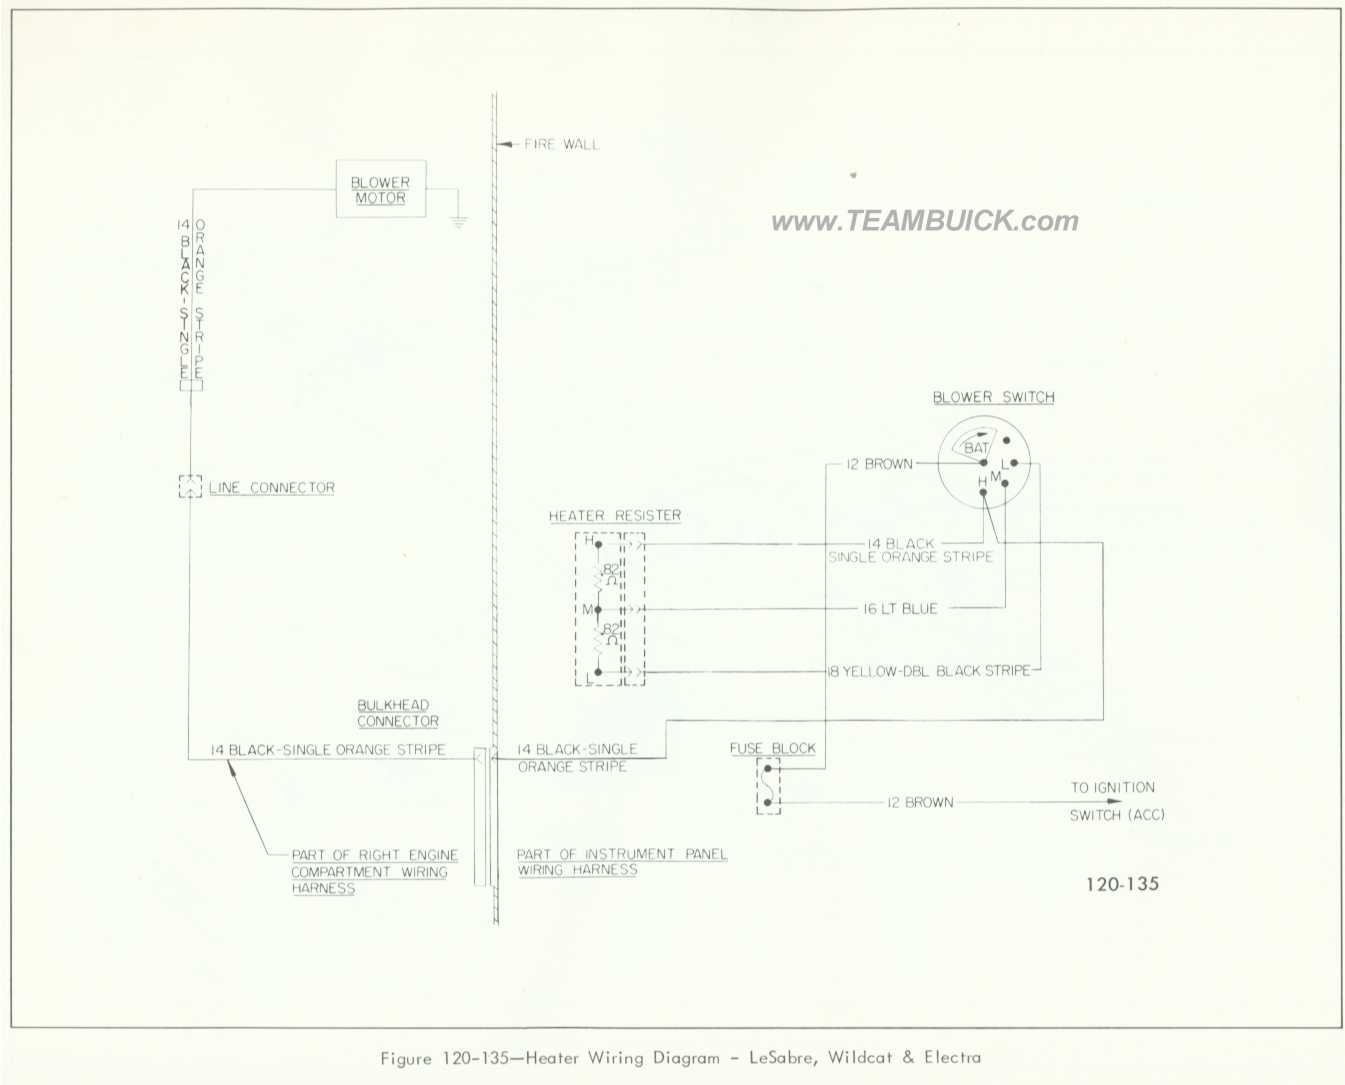 1966 Buick Lesabre  Wildcat  Electra  Heater Wiring Diagram